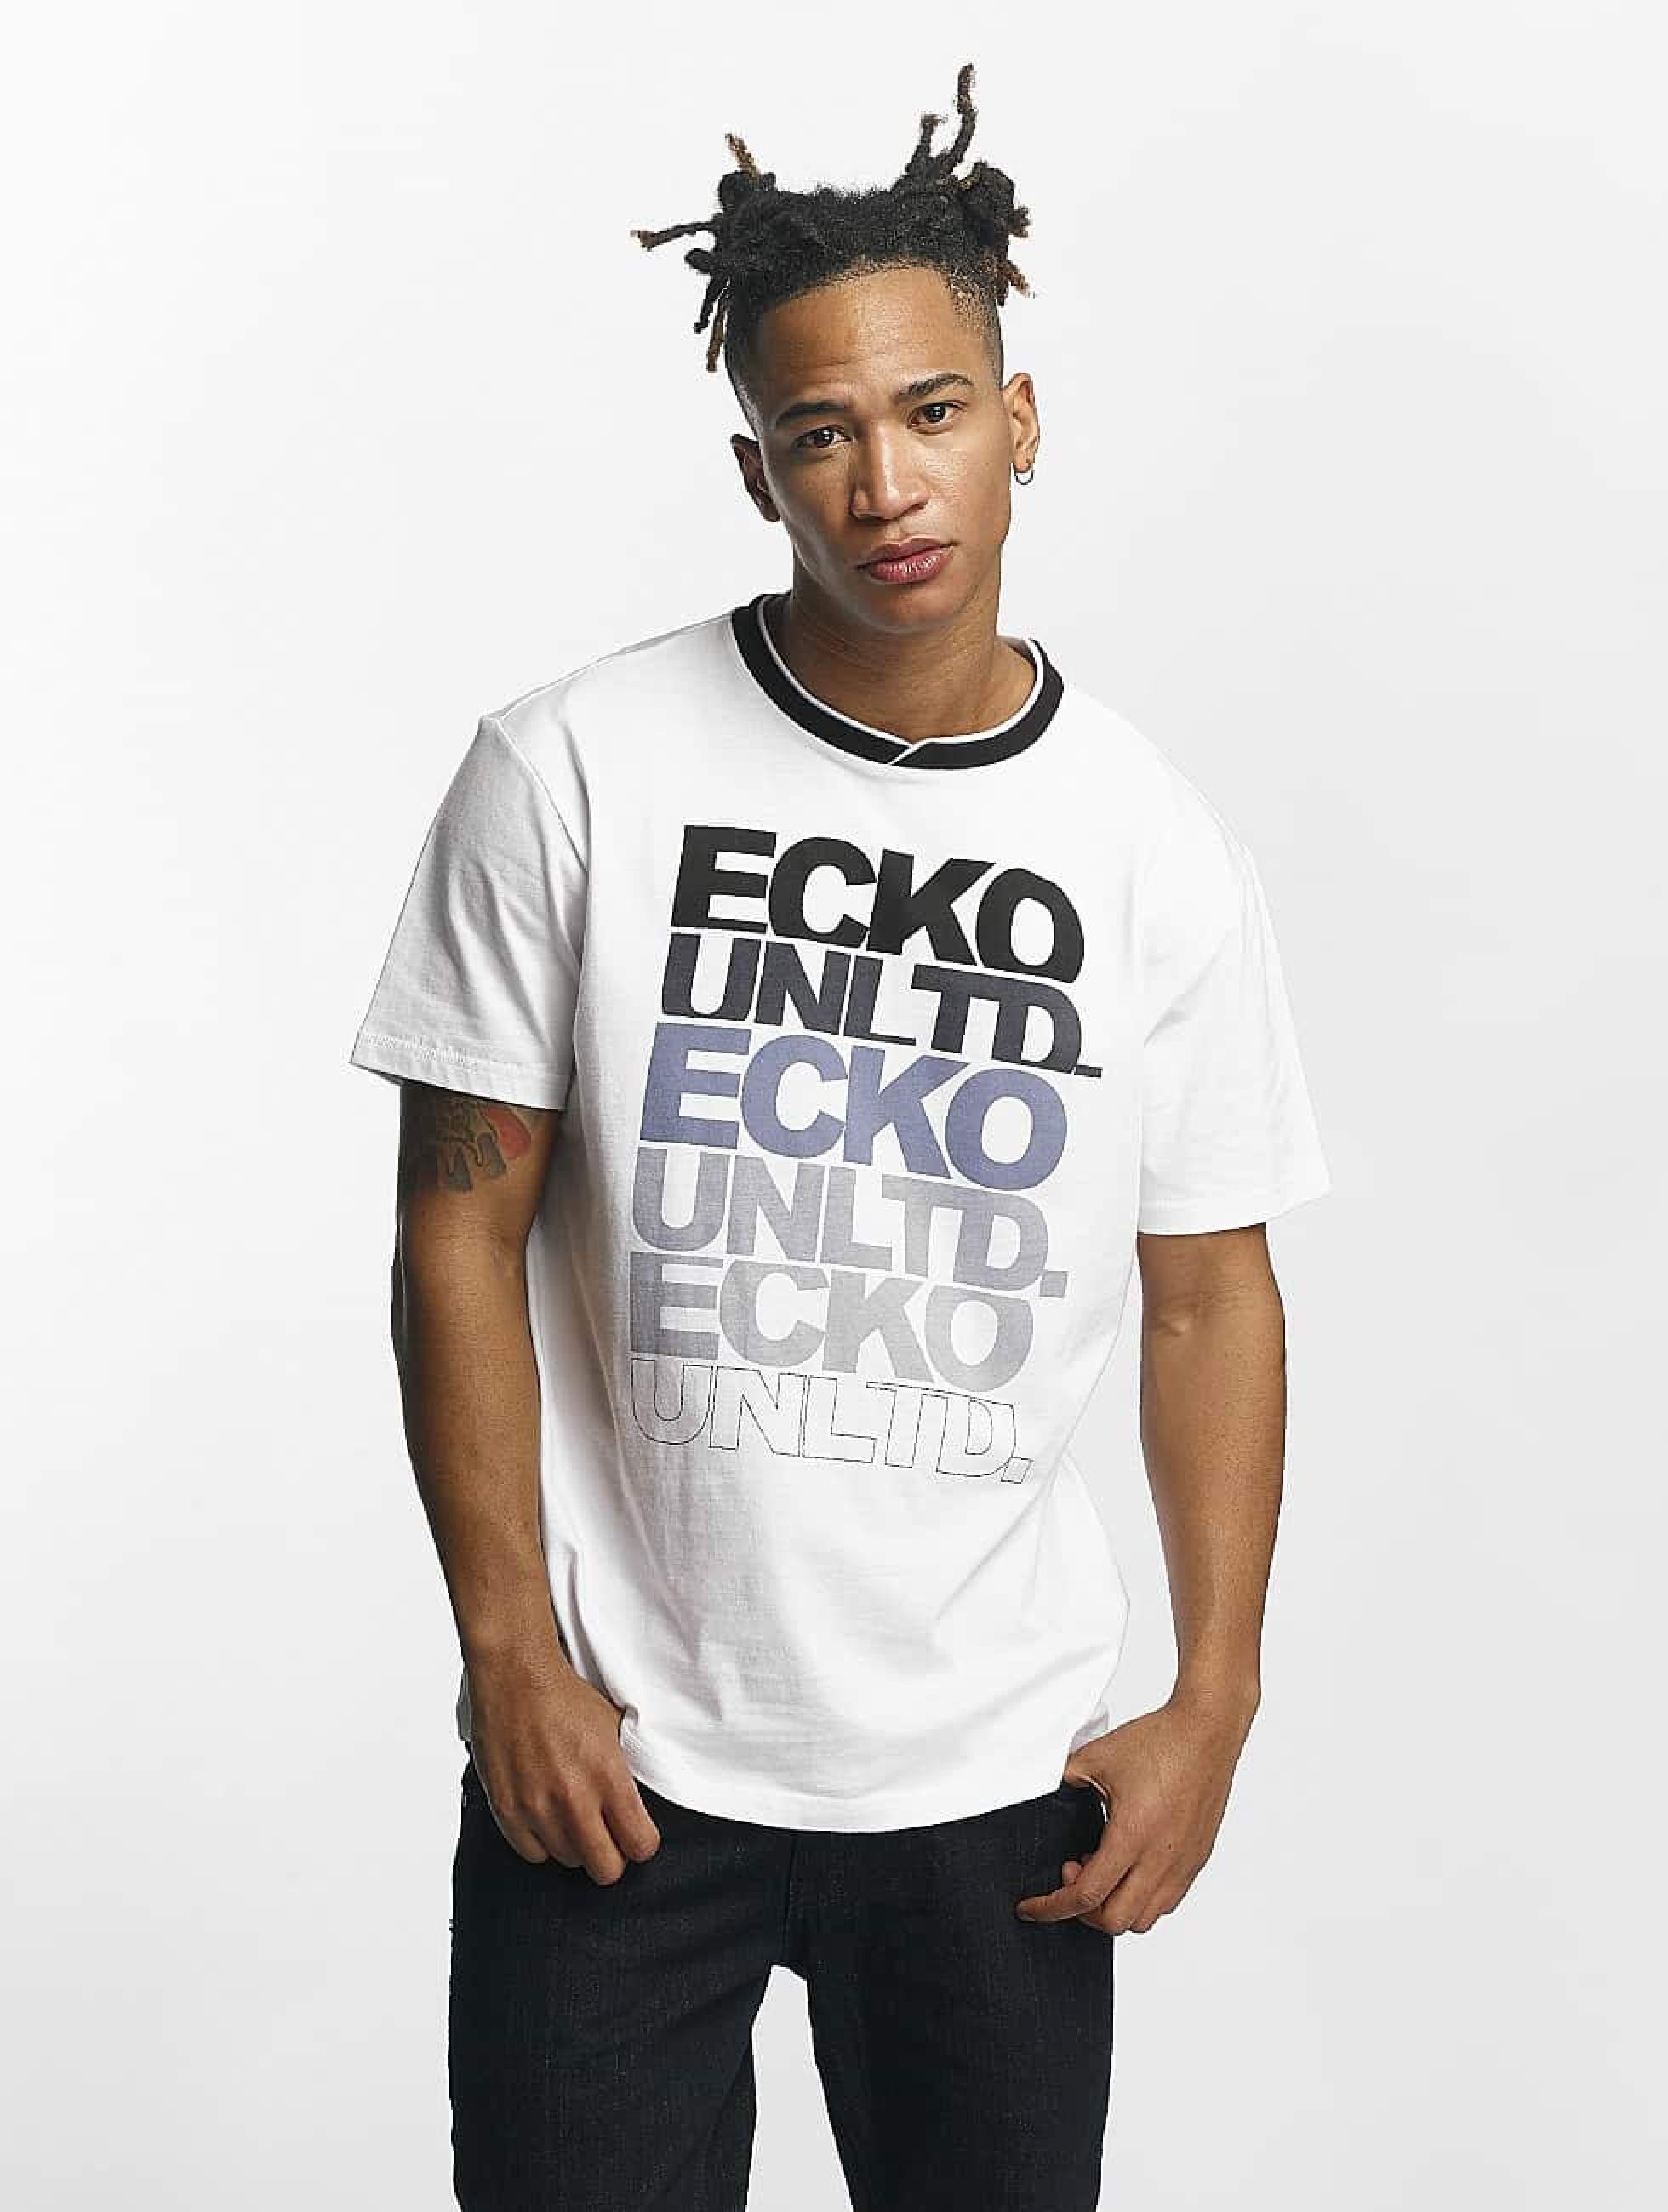 Ecko Unltd. / T-Shirt Fuerteventura in white 4XL